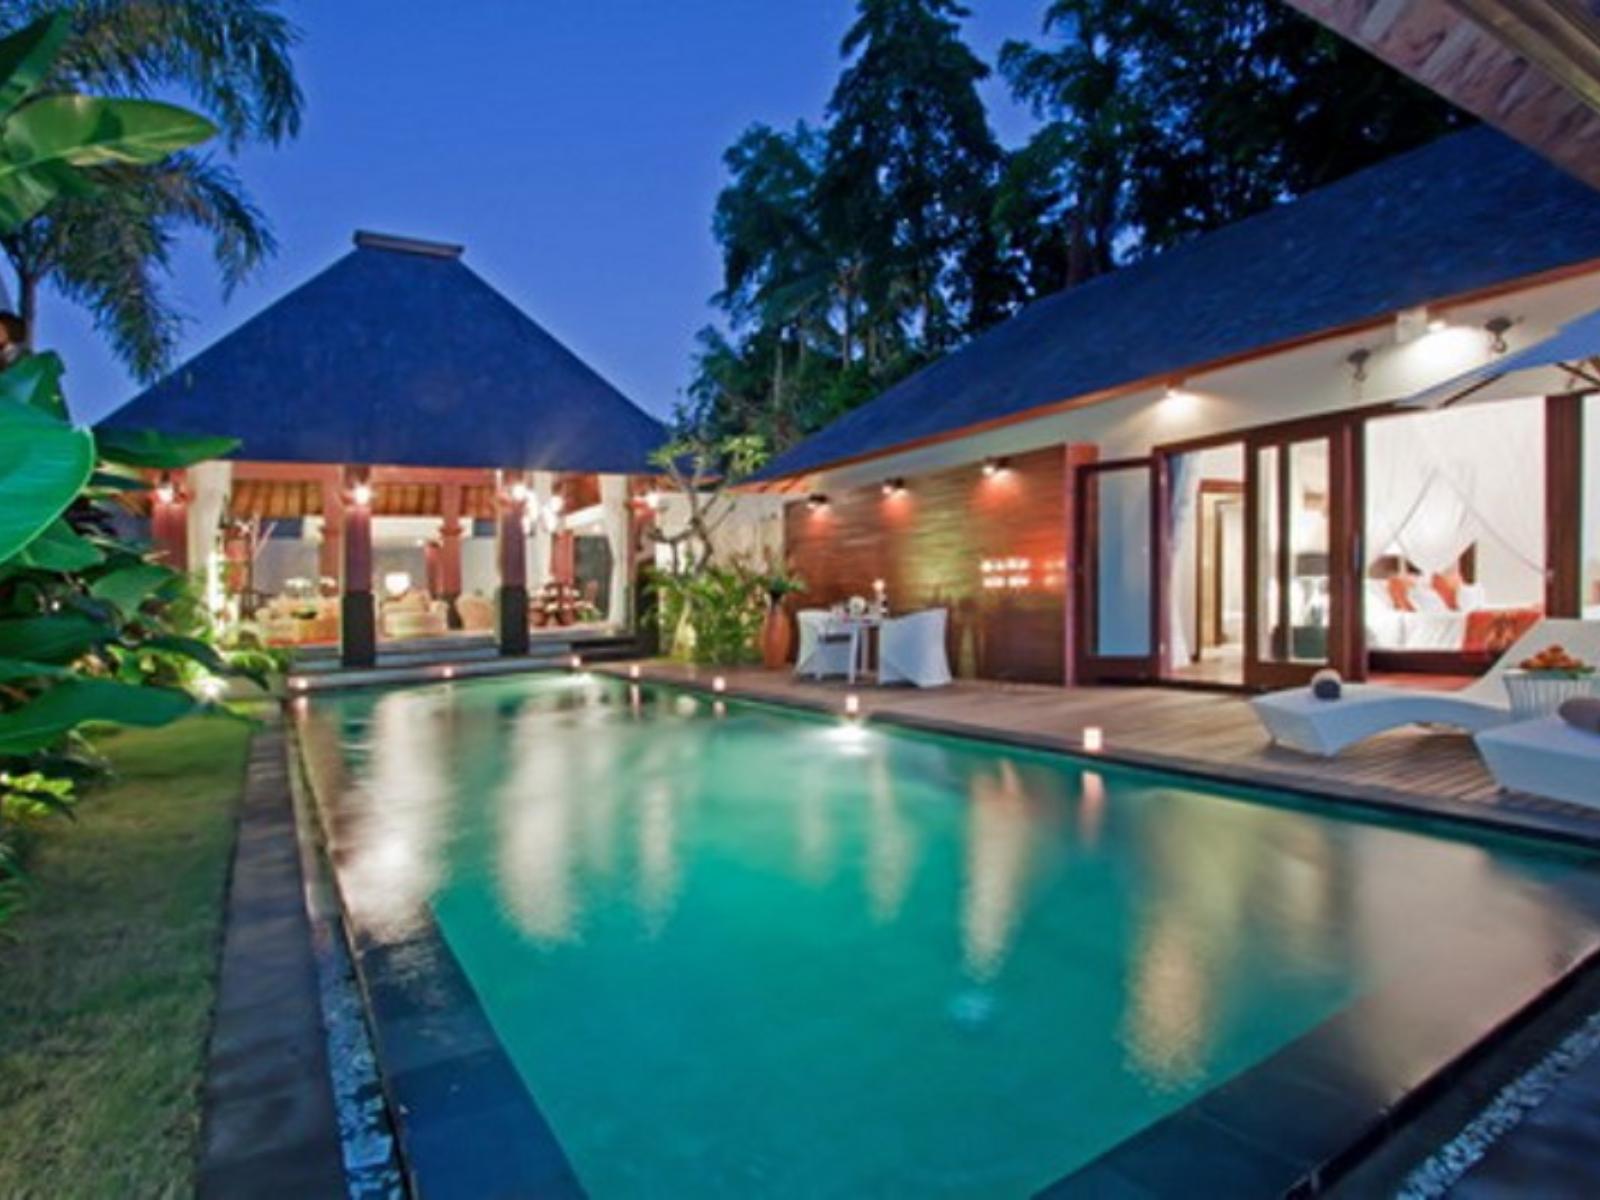 villa dani arwana estate villaway rh villaway com